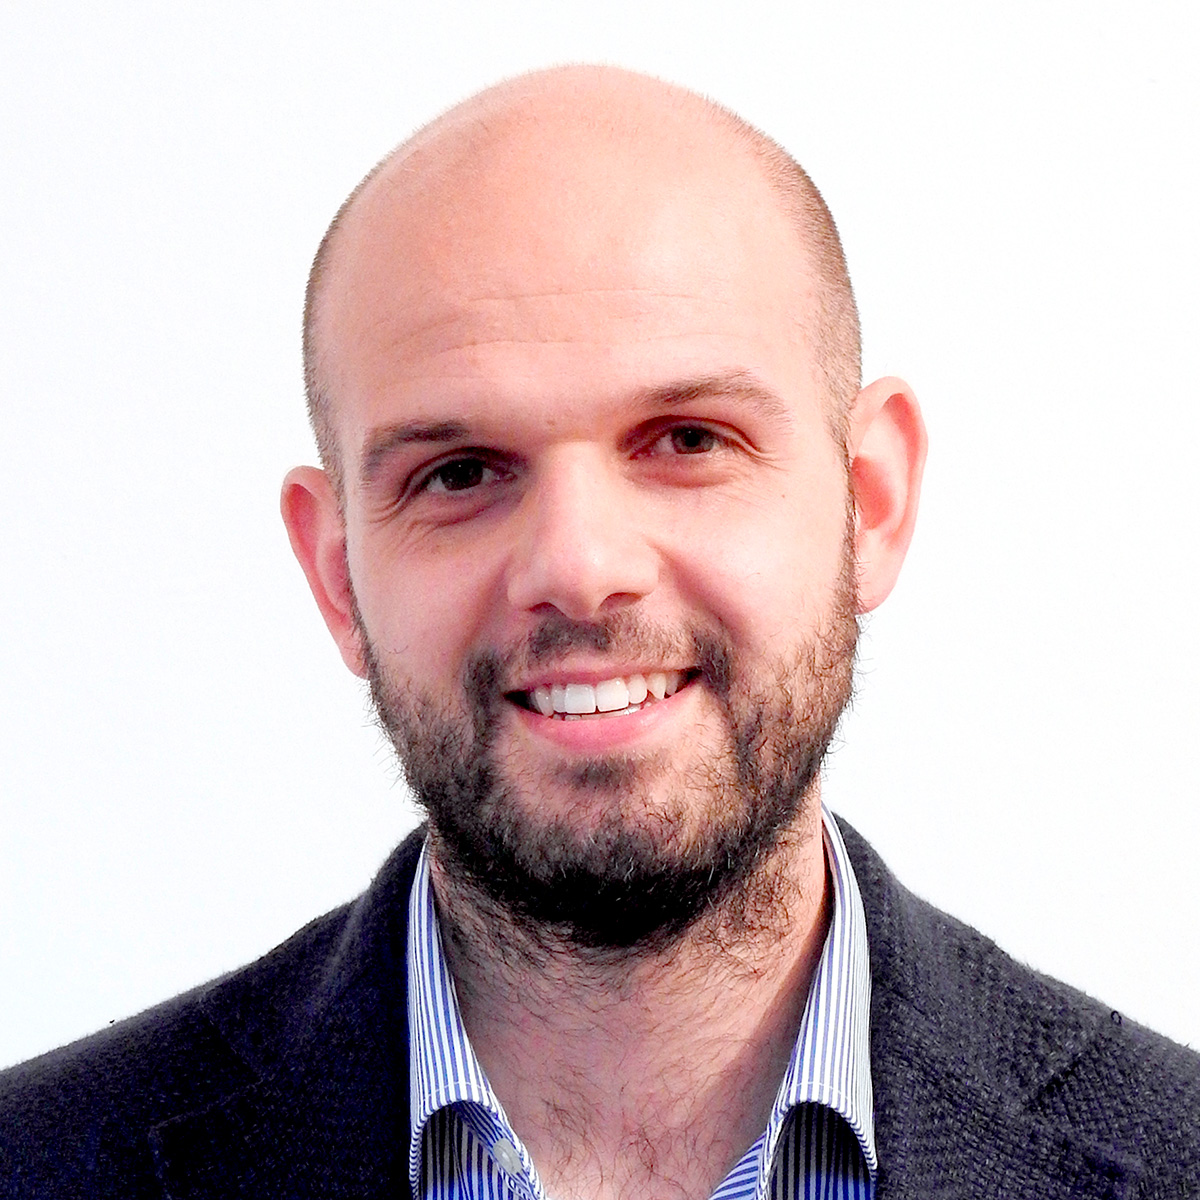 Francesco Pio Colosi